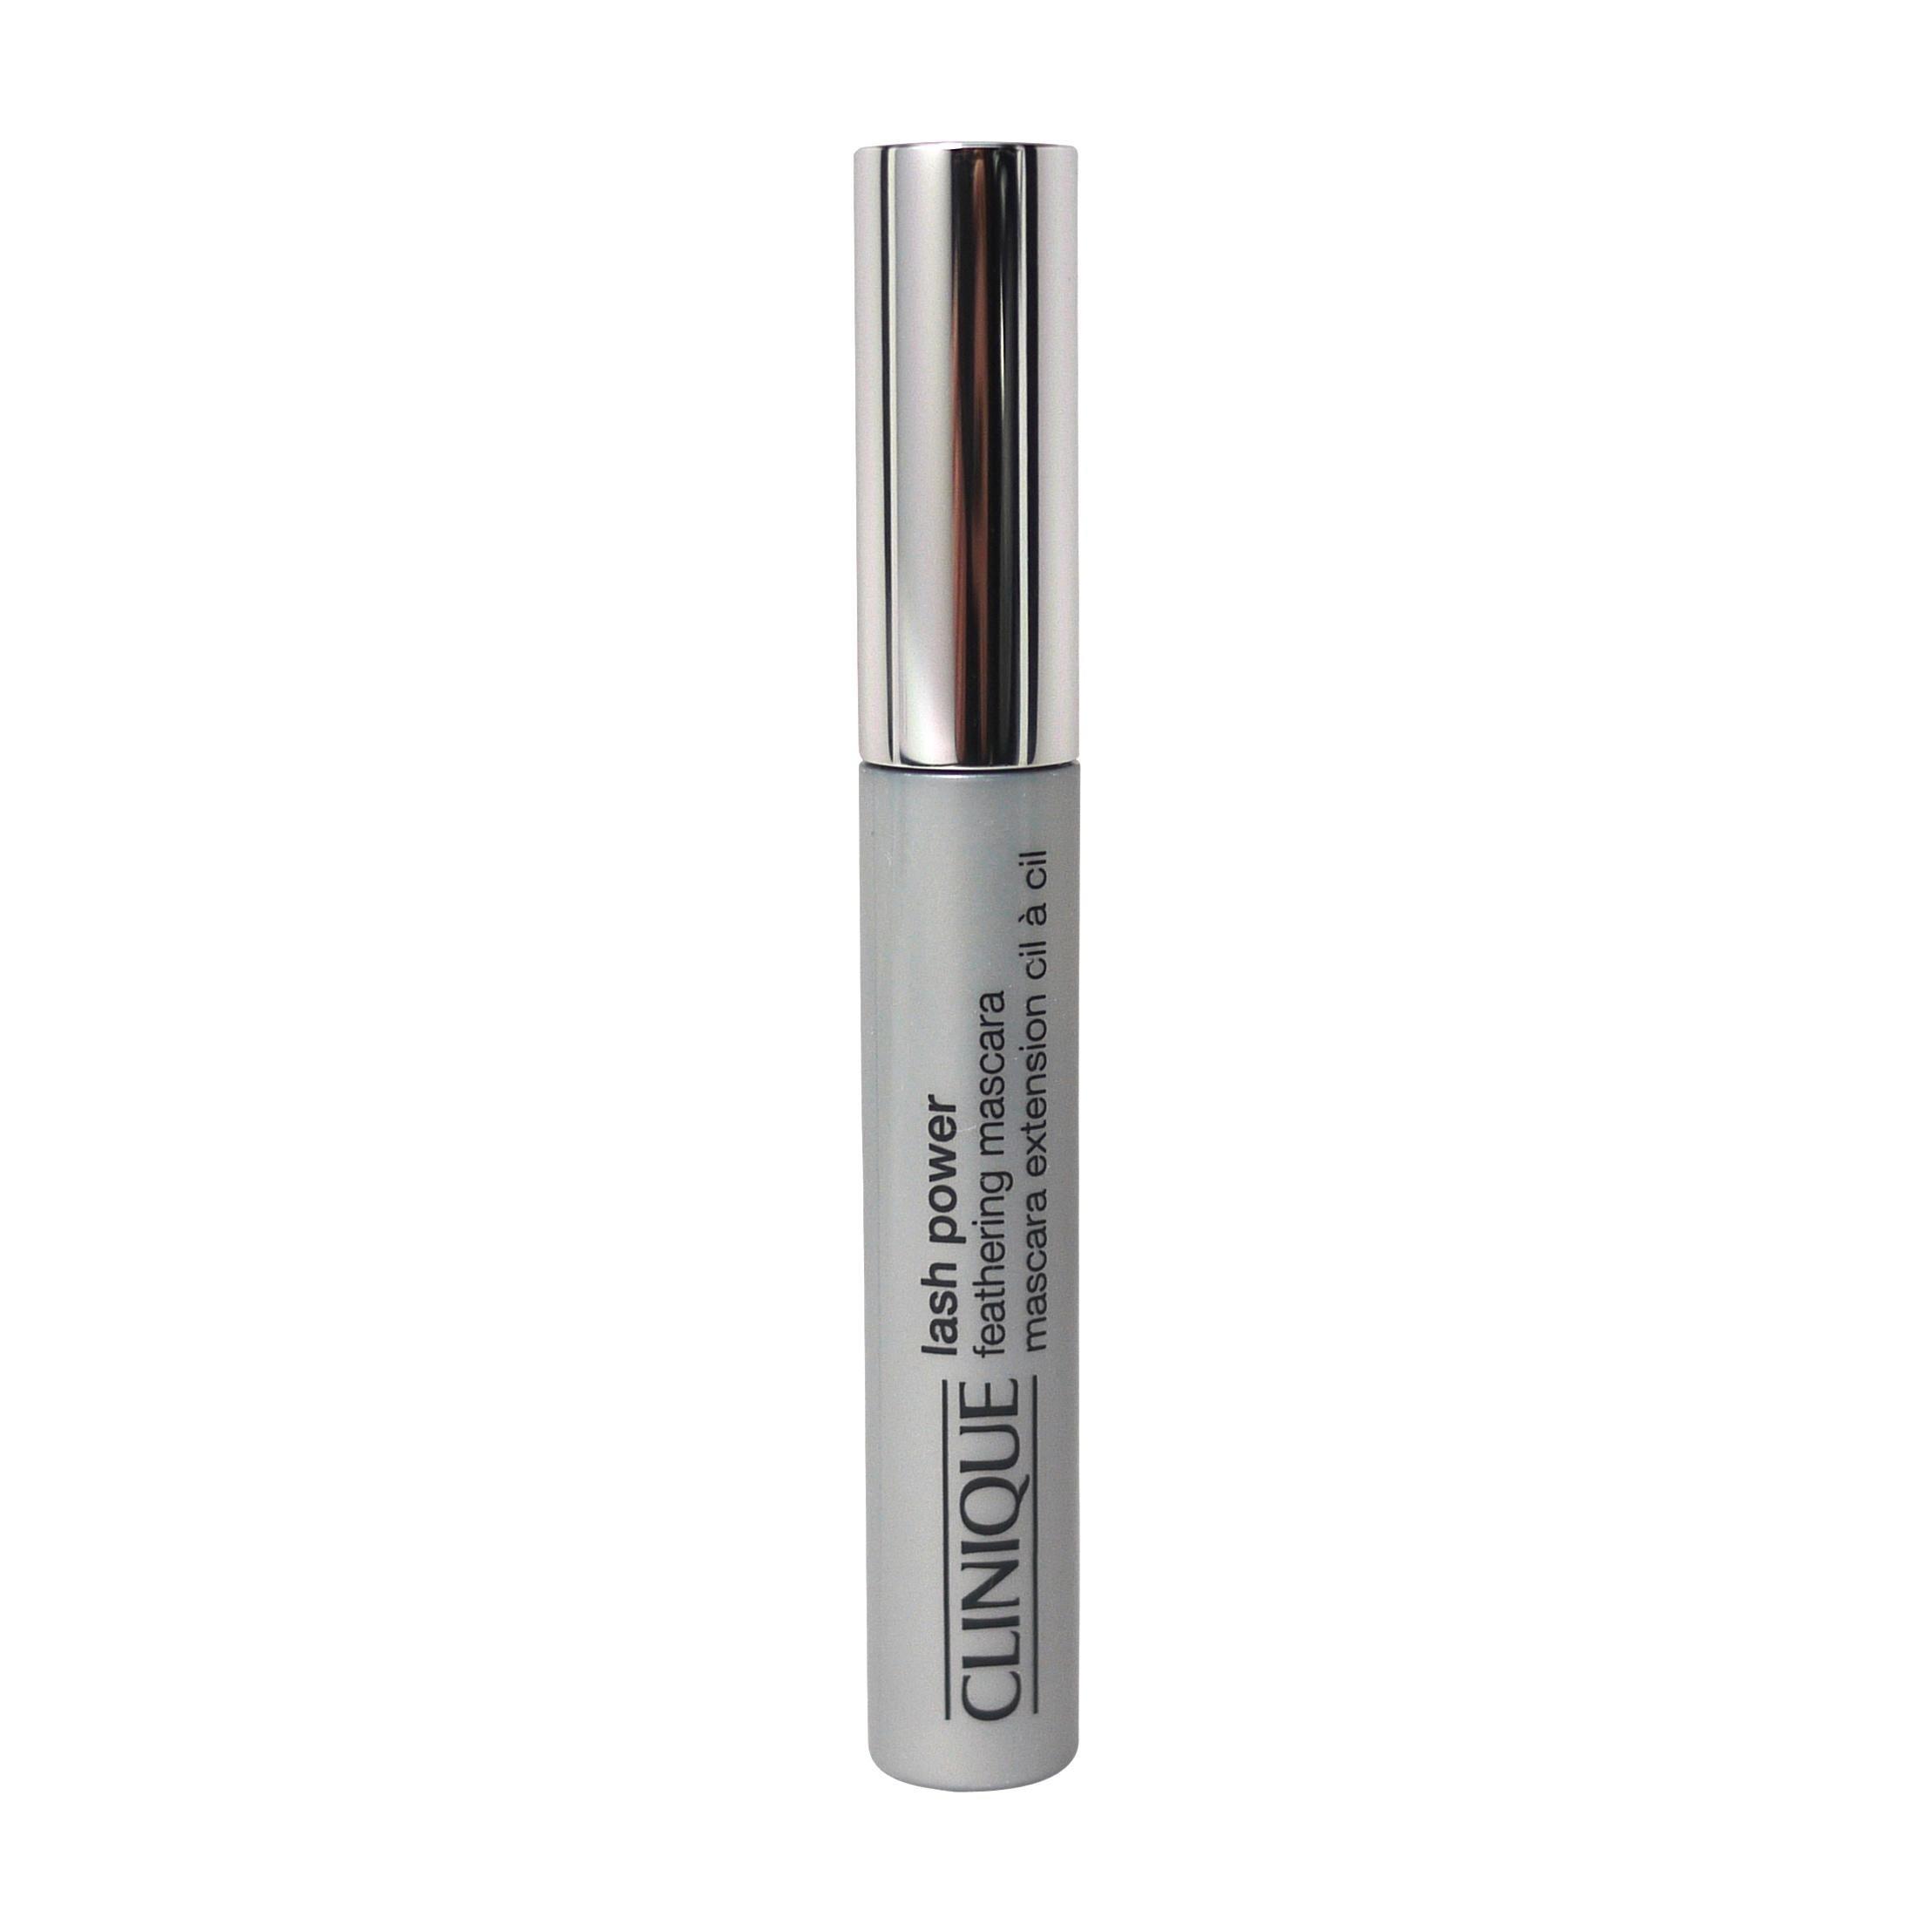 2 Clinique Lash Power Lenghtening Mascara - # 01 Black Onyx - 5.5ml/0.21oz (Lot of 2)